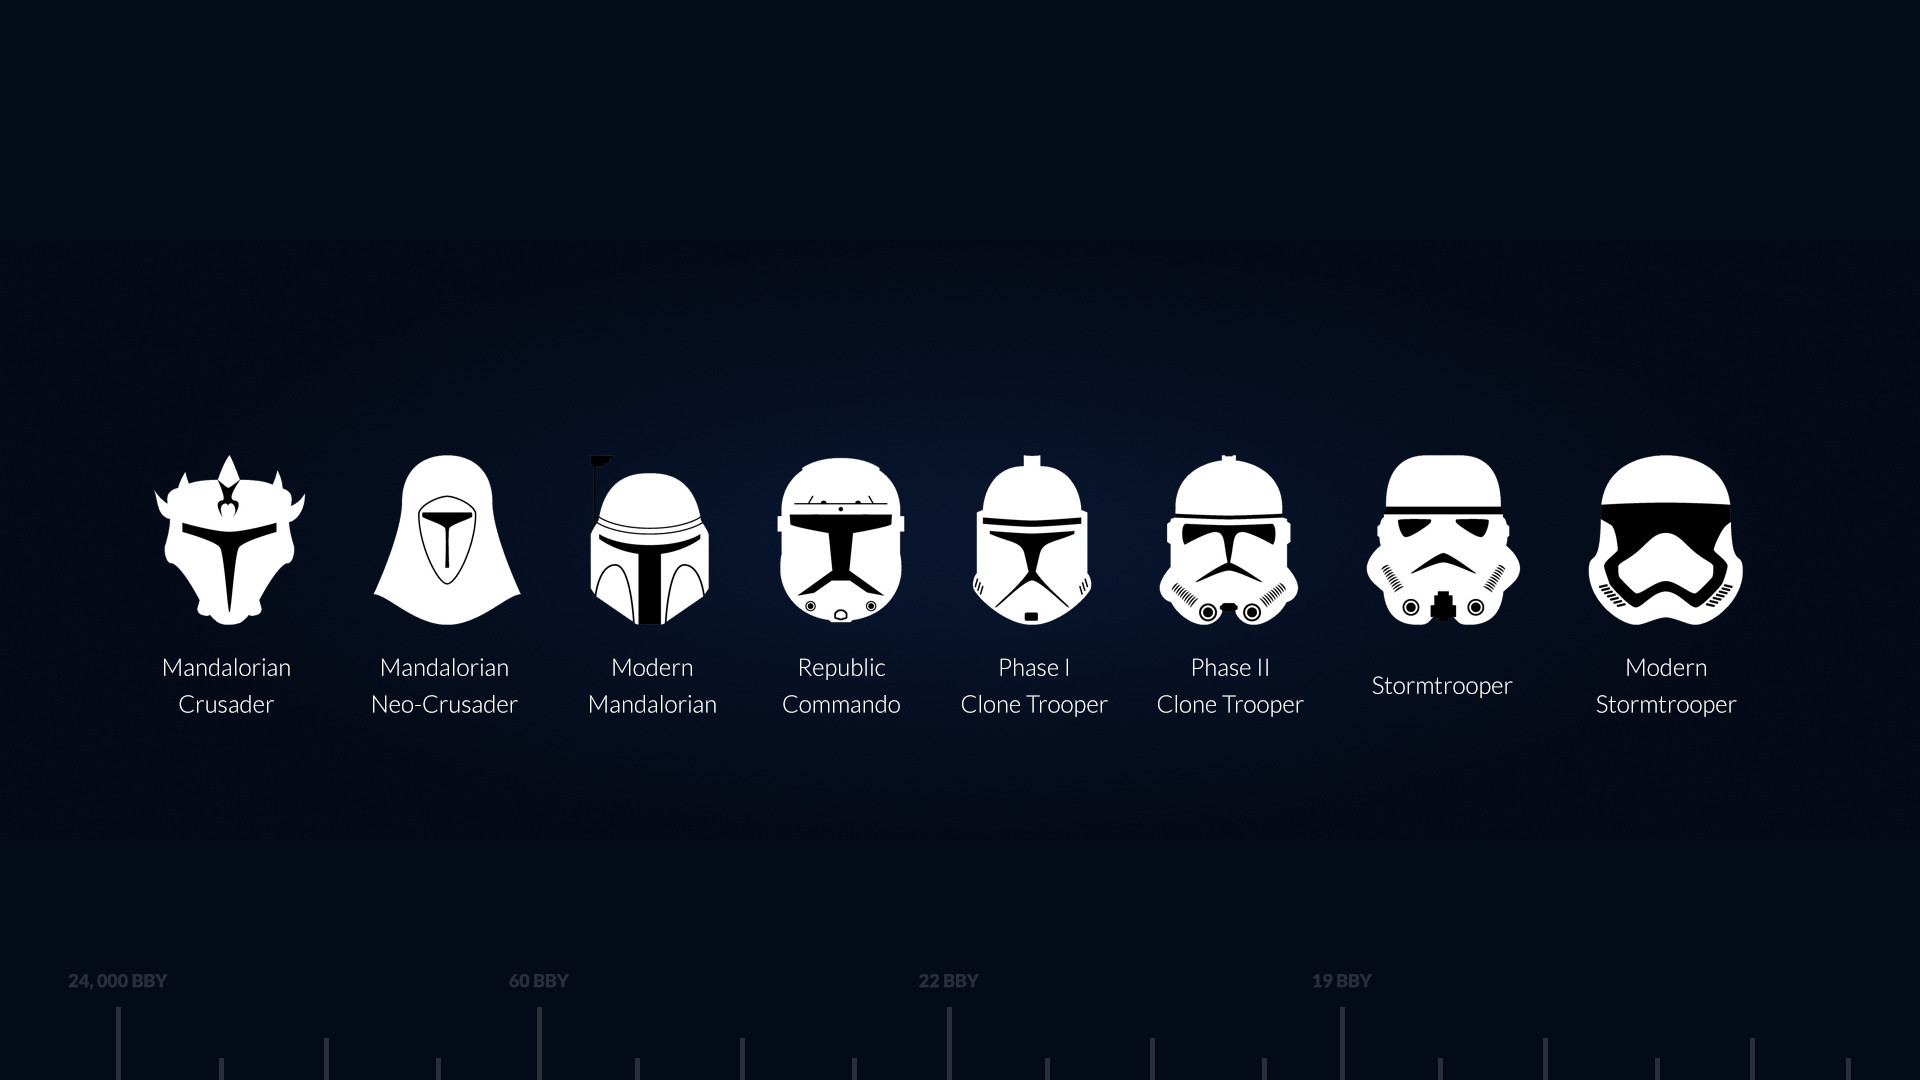 Star Wars Hd Widescreen Wallpaper 75 Images